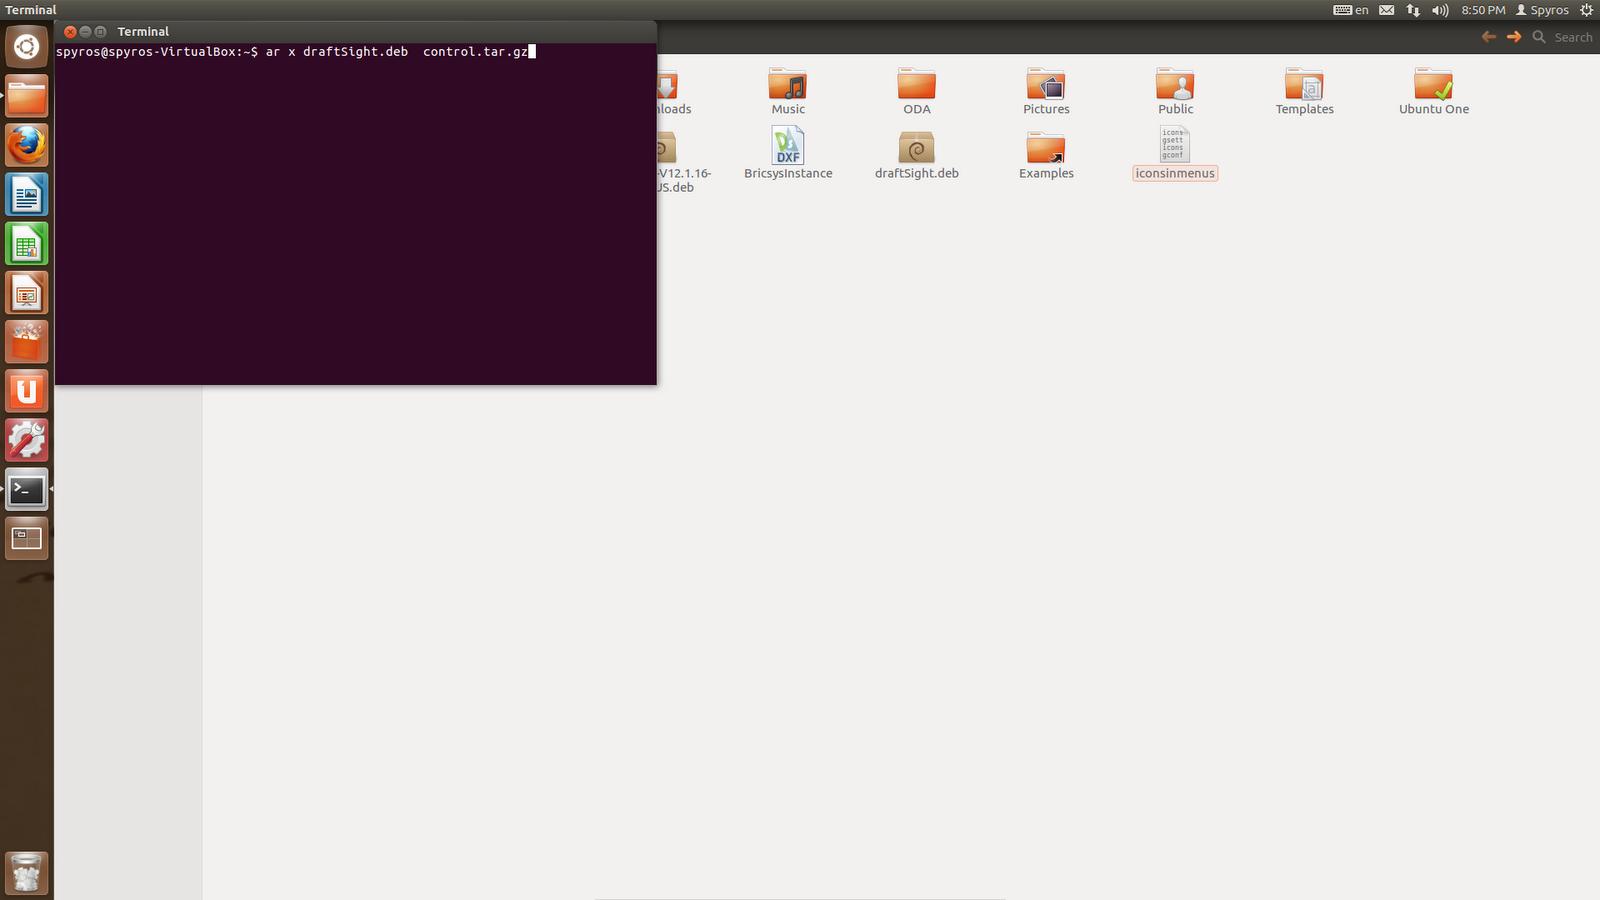 Linux Aided Design: DraftSight and Ubuntu 12 04 LTS 64bit